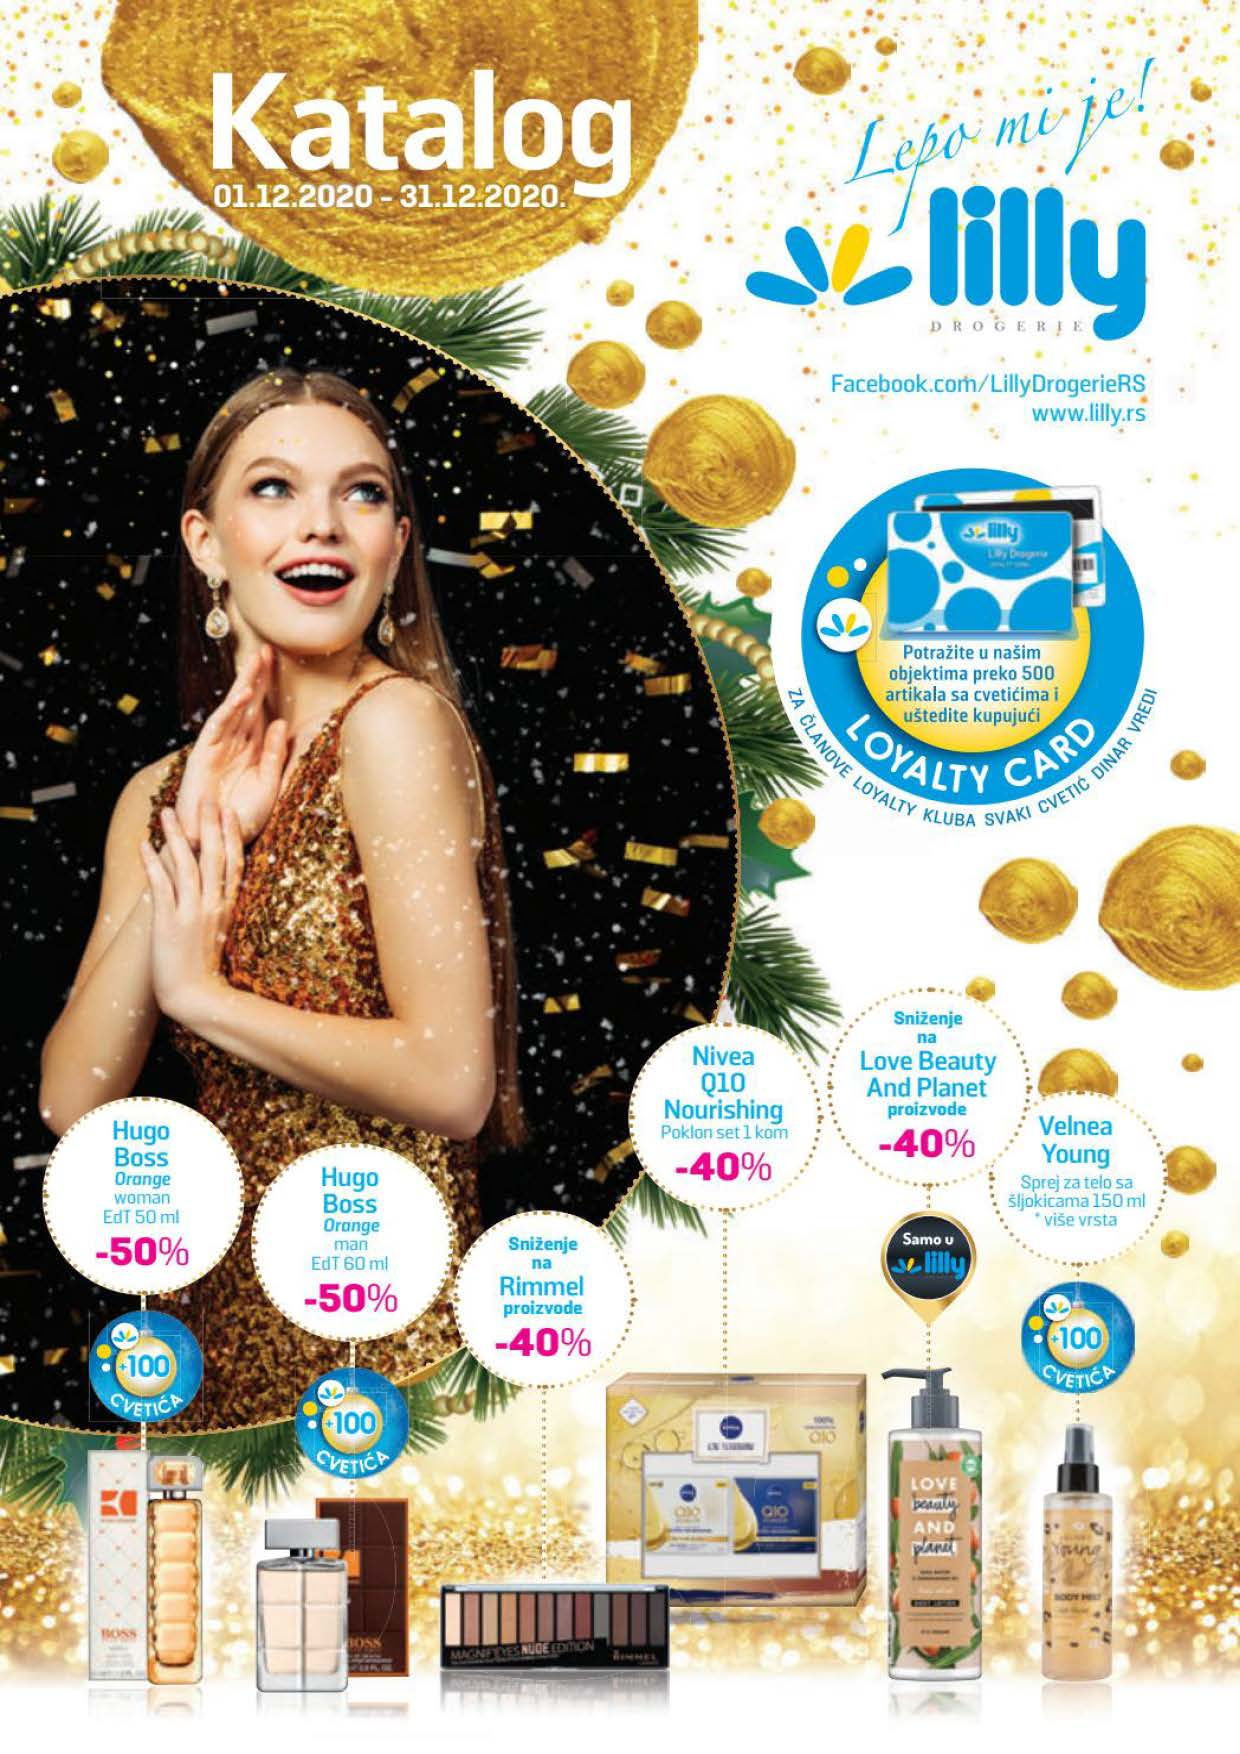 LILLY katalog LILLY ONLINE Akcija DECEMBAR 2020 01.12.2020. 31.12.2020. Page 01